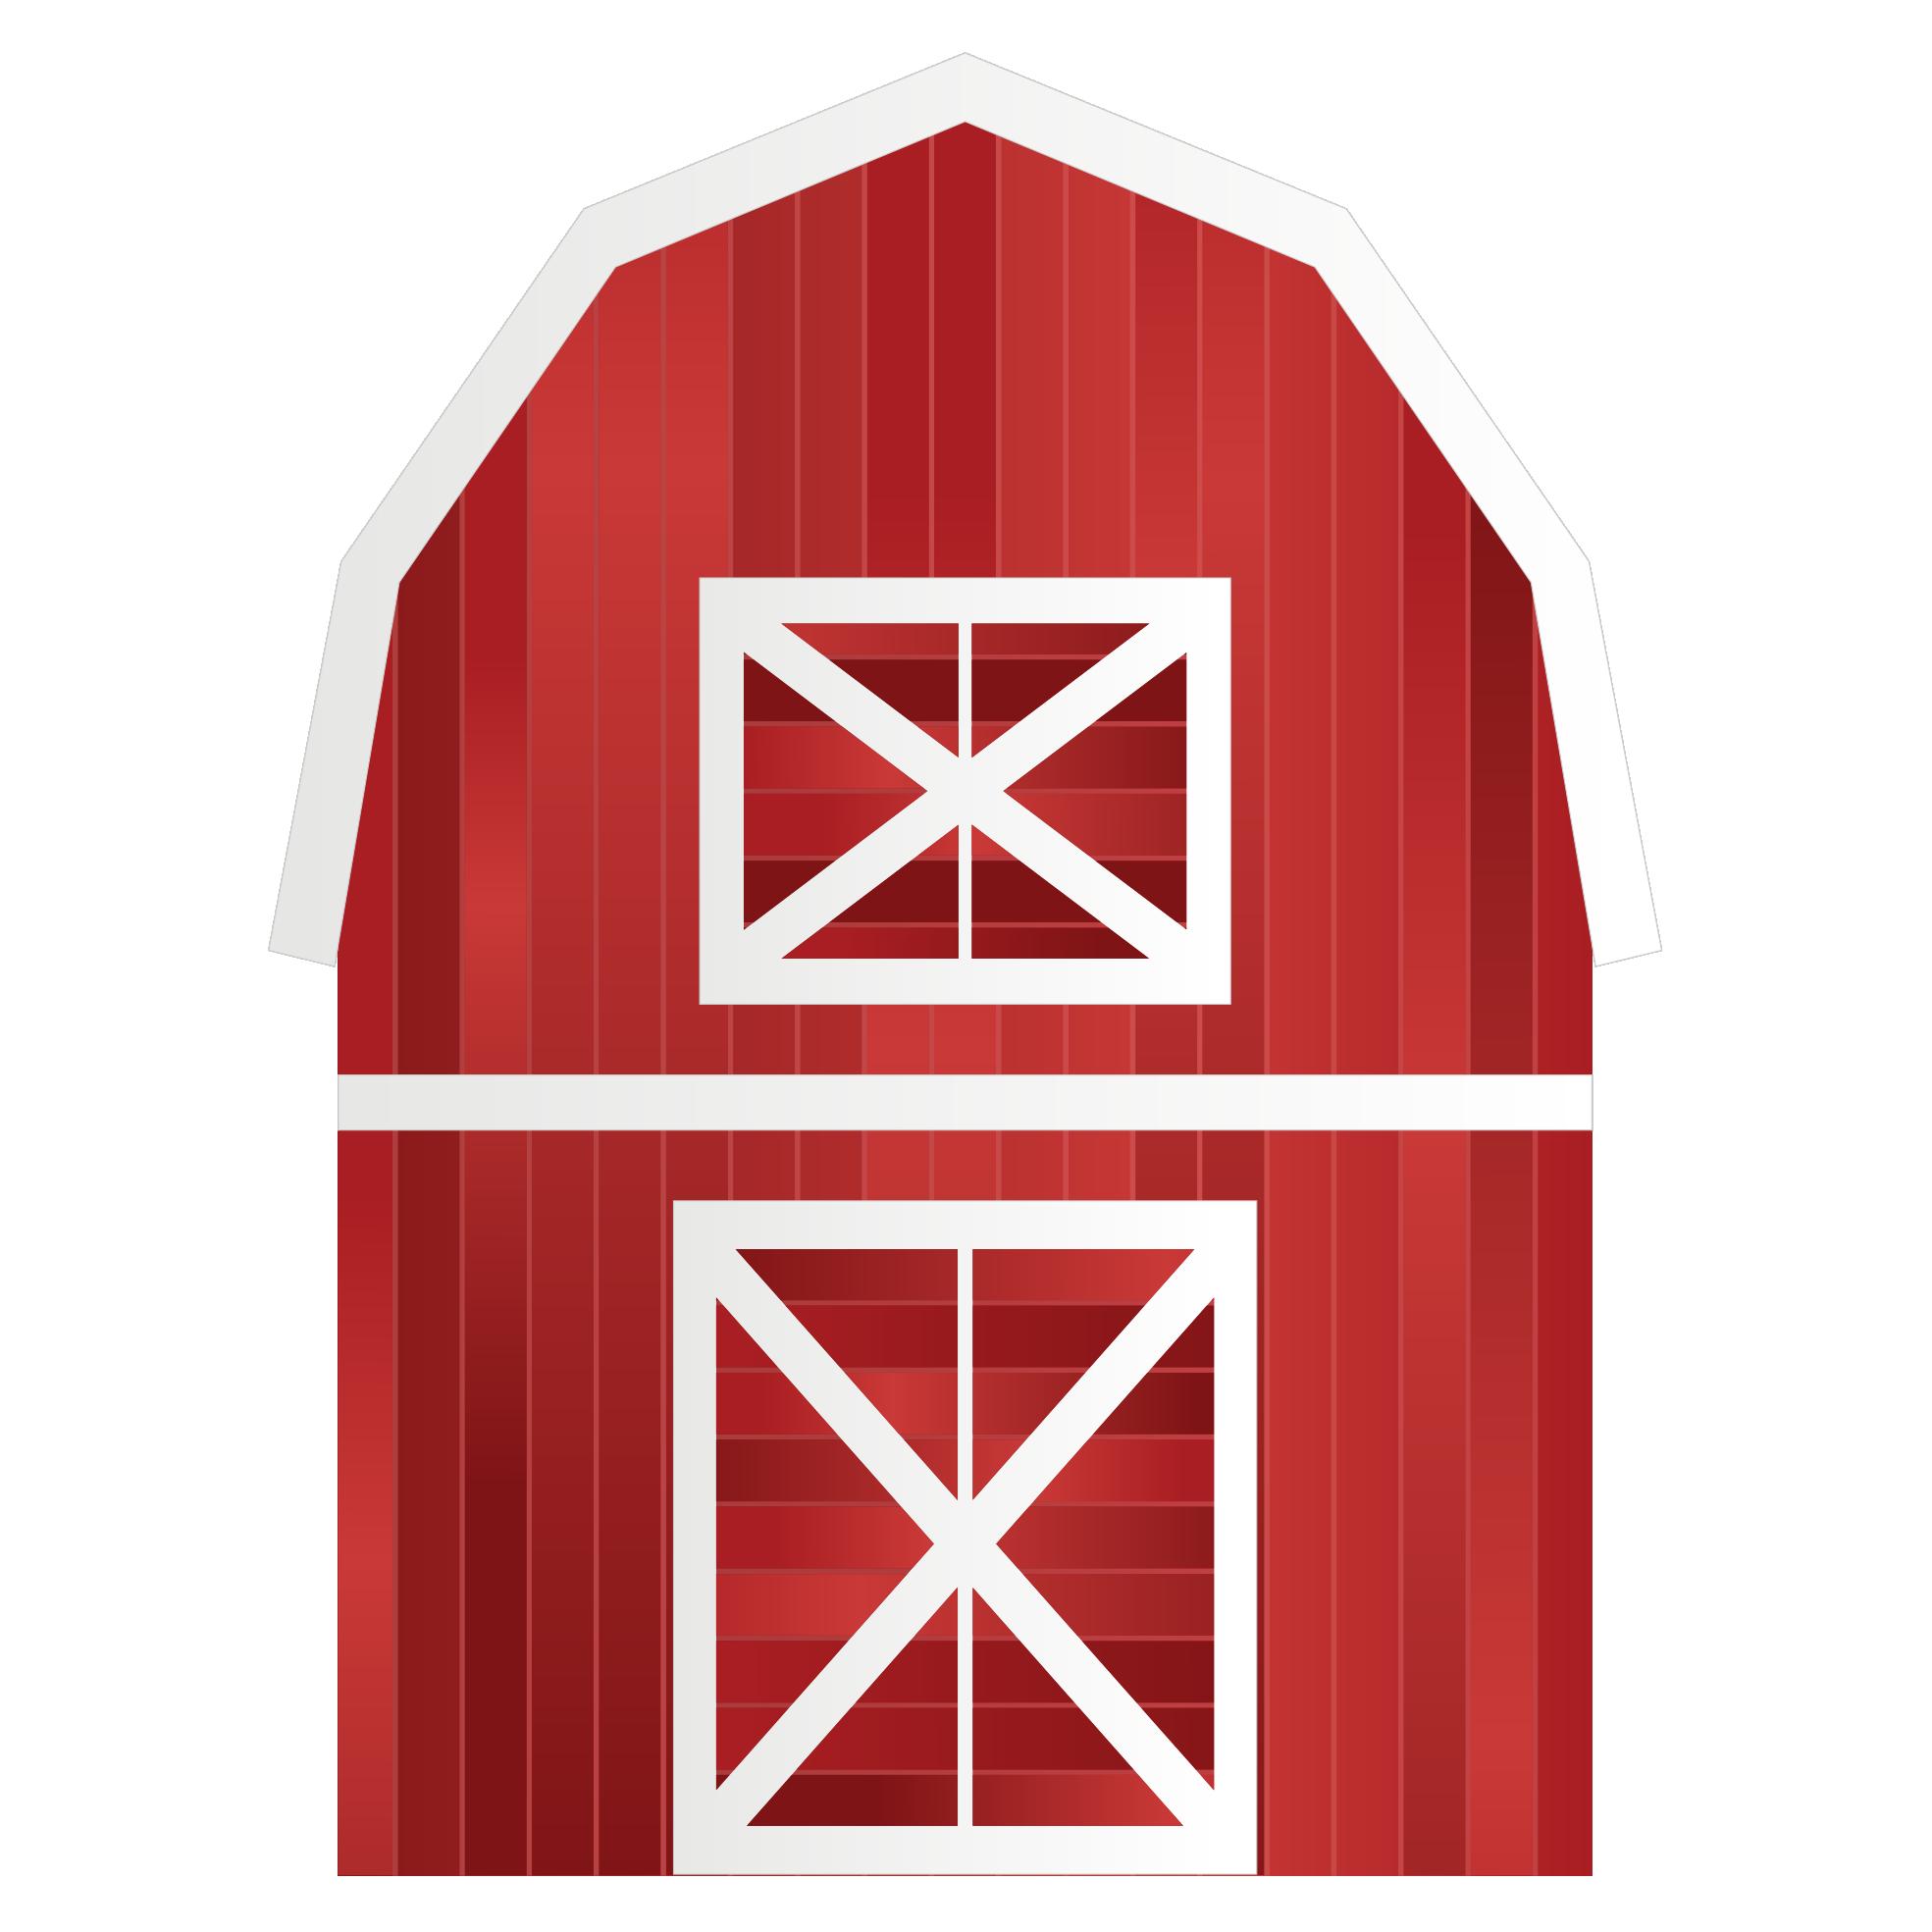 1969x1969 Clip Art Abstract Farm Barn Scalable Vector